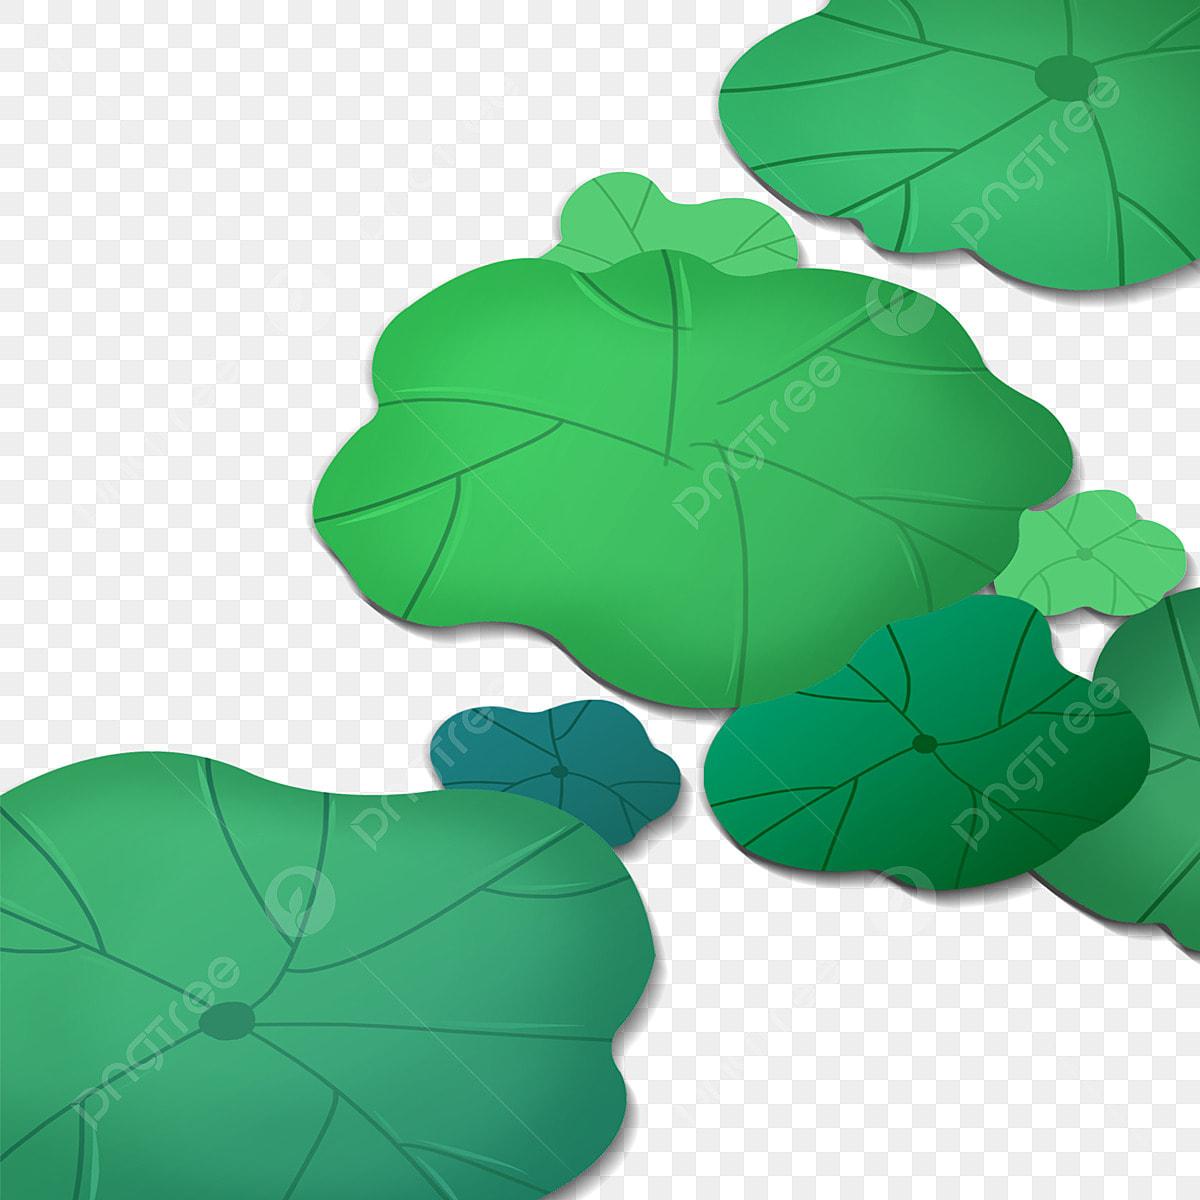 Green plant, Green tea Matcha Leaf Breakfast, tea green transparent  background PNG clipart | HiClipart